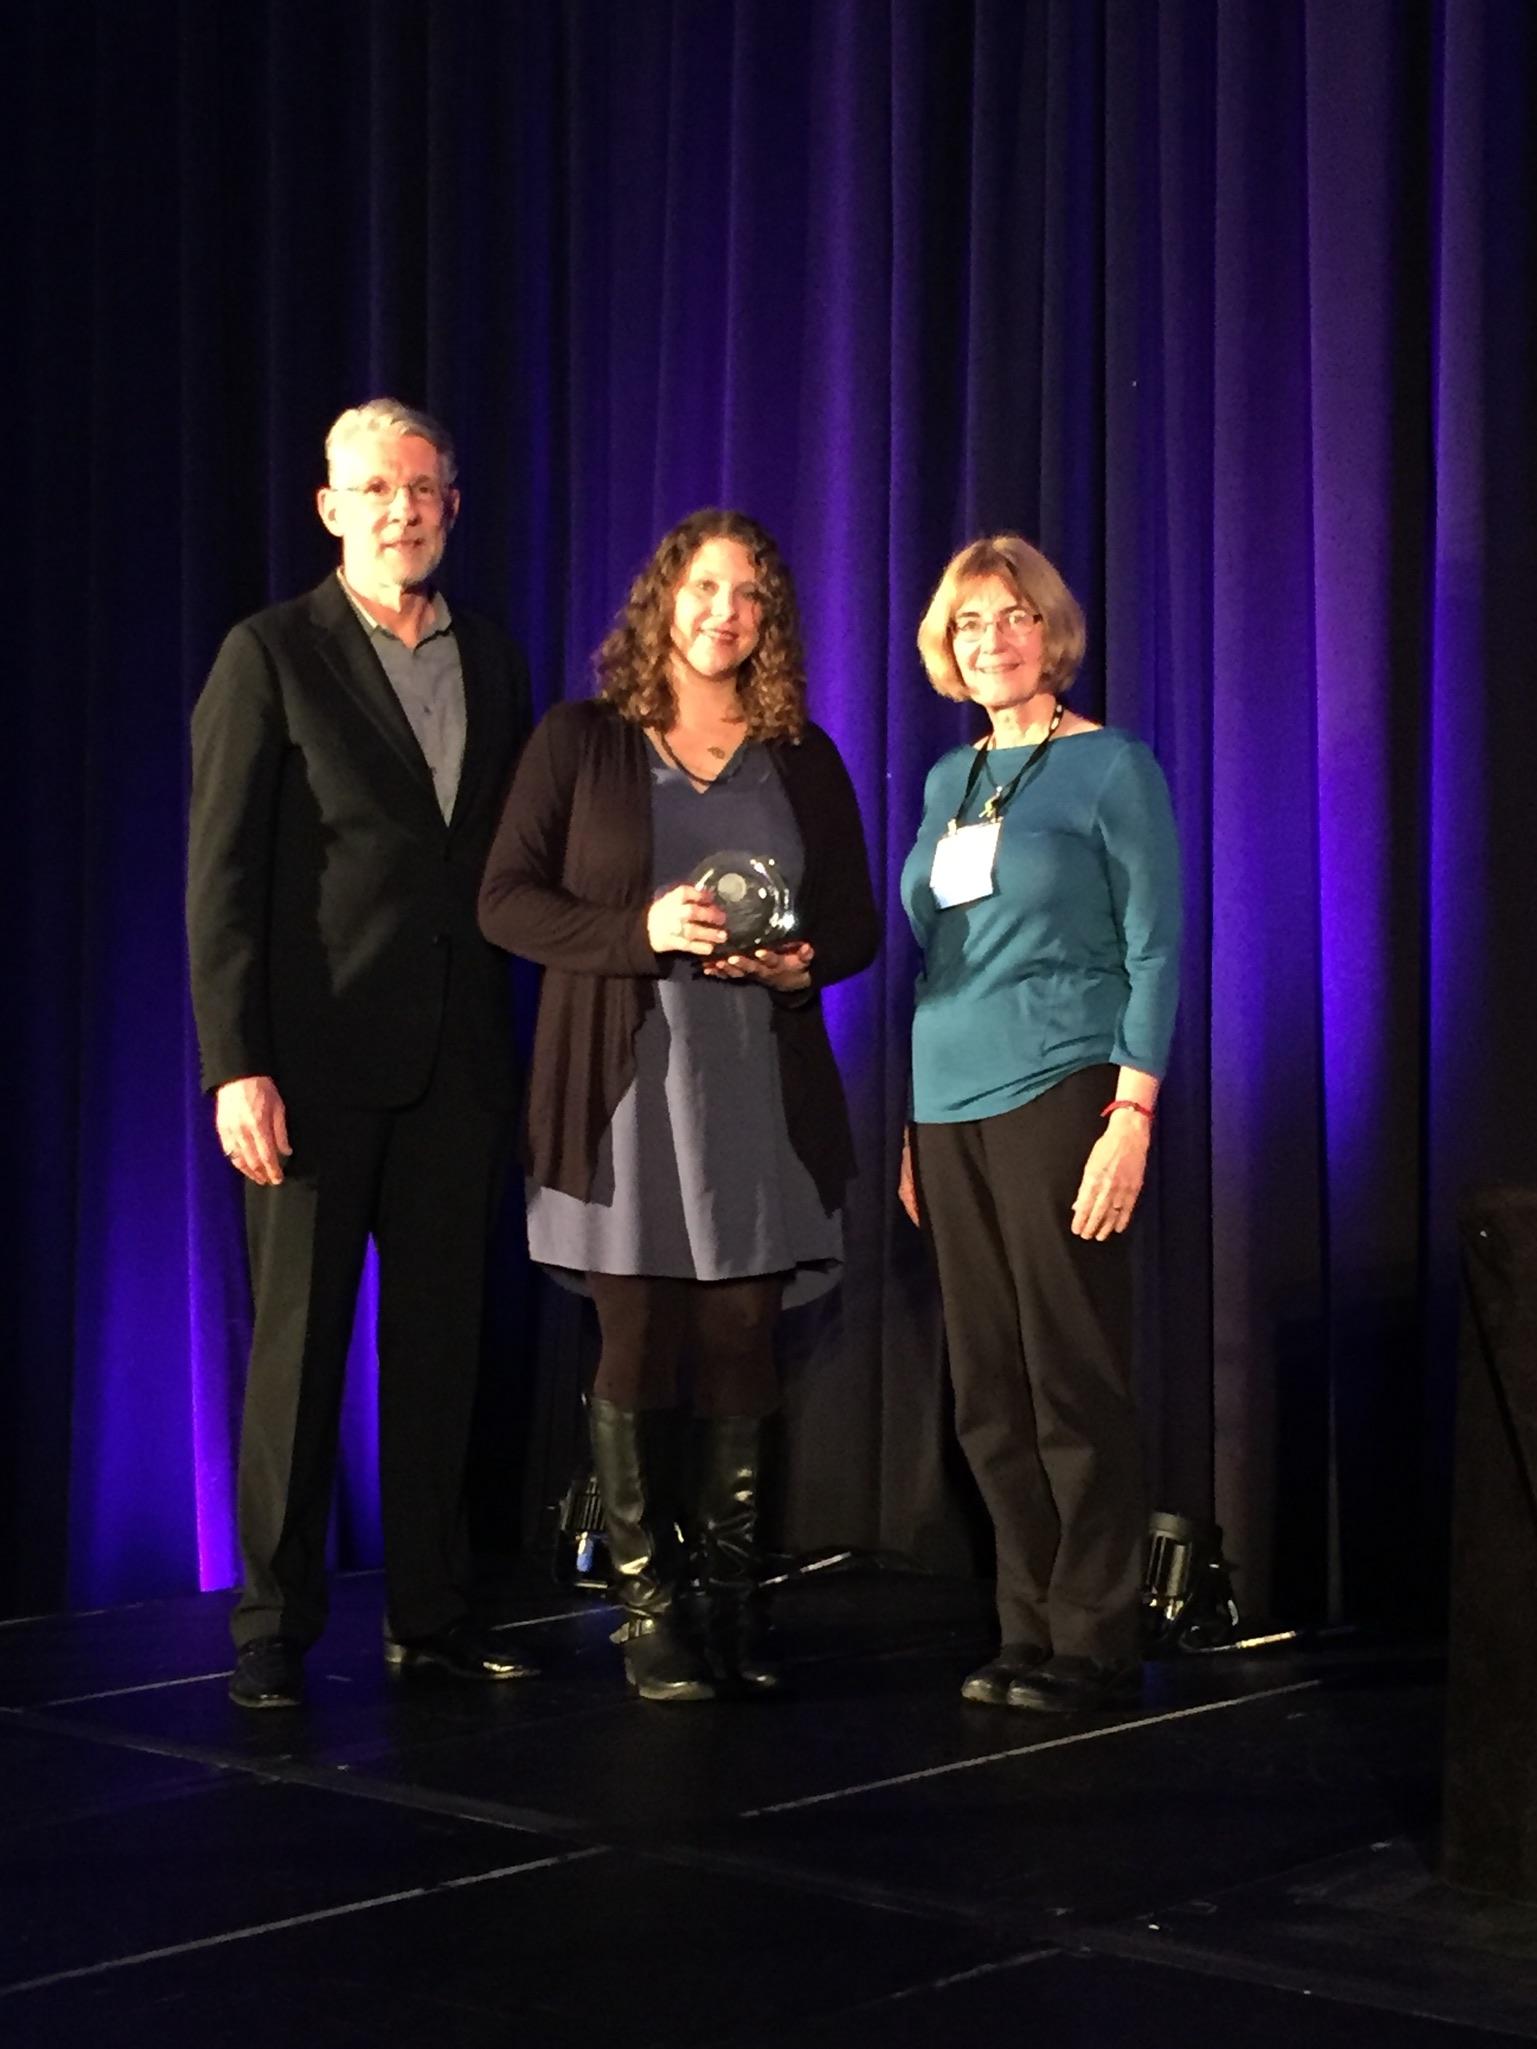 Kate Noon receiving her award